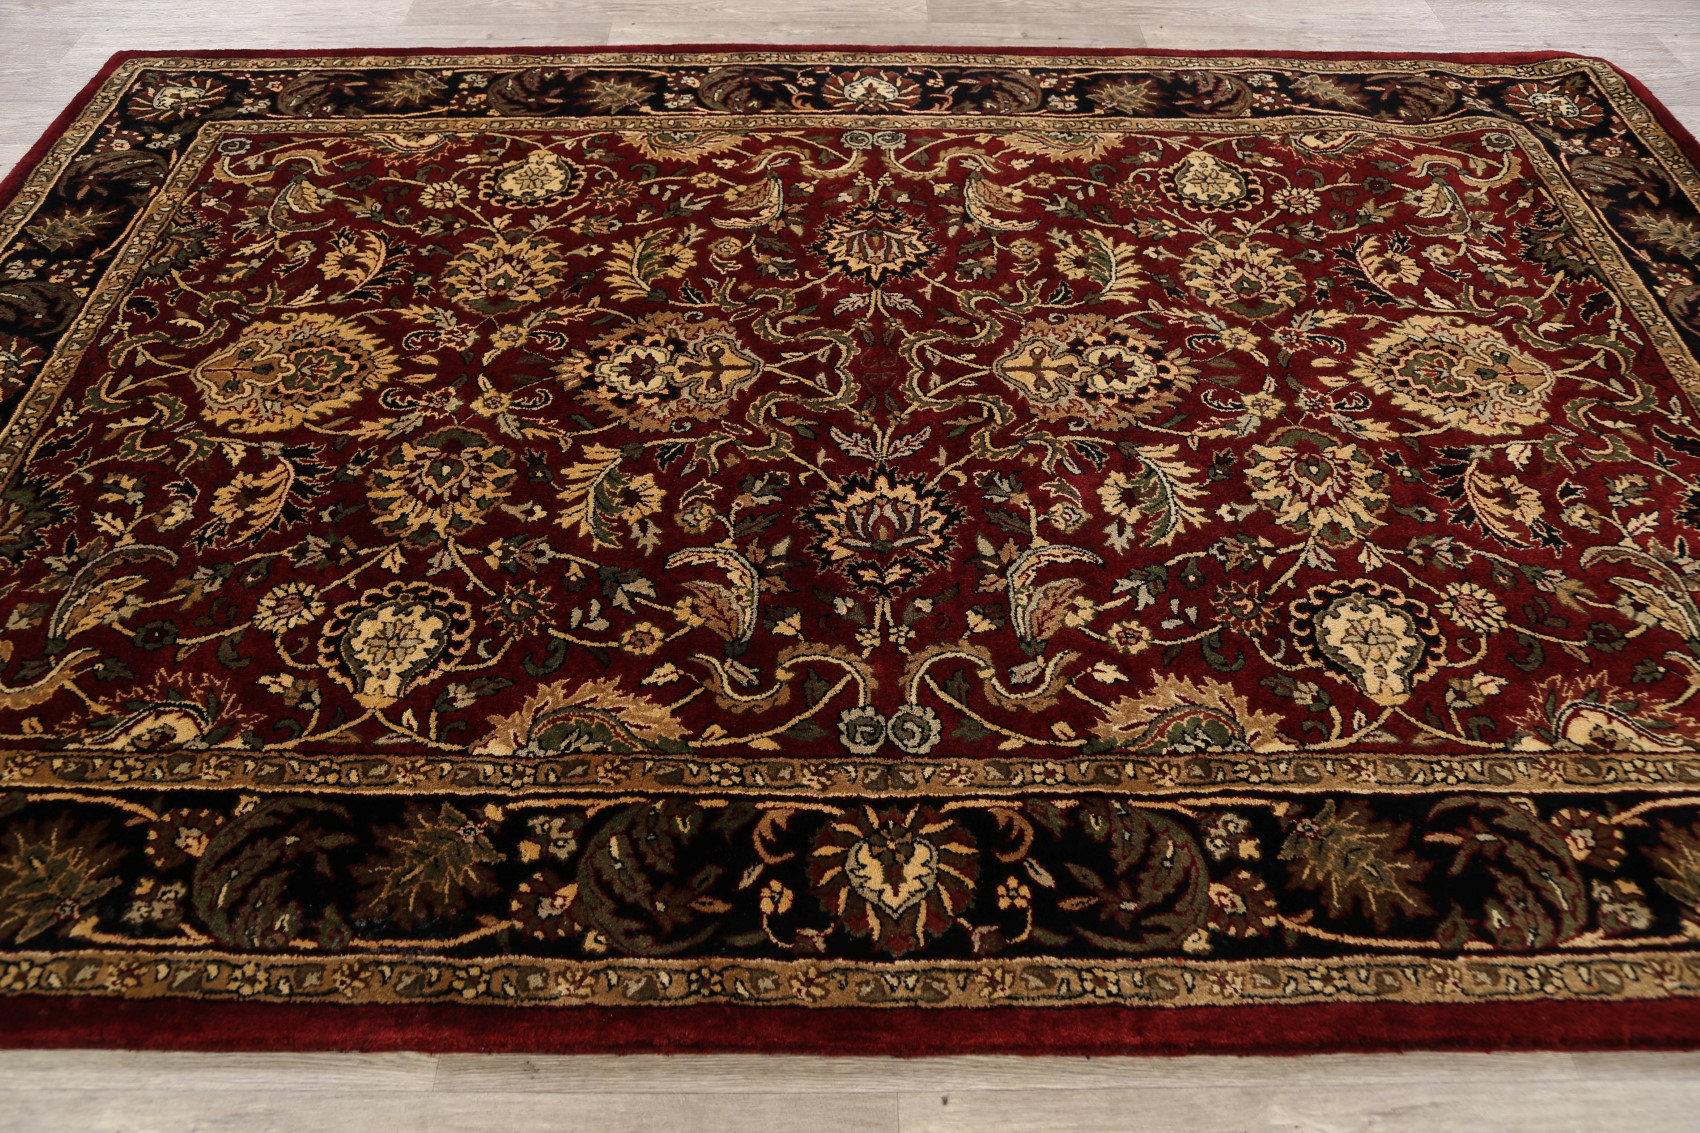 Rugsource Oriental Handmade Tufted Wool Red Black Ivory Area Rug Wayfair